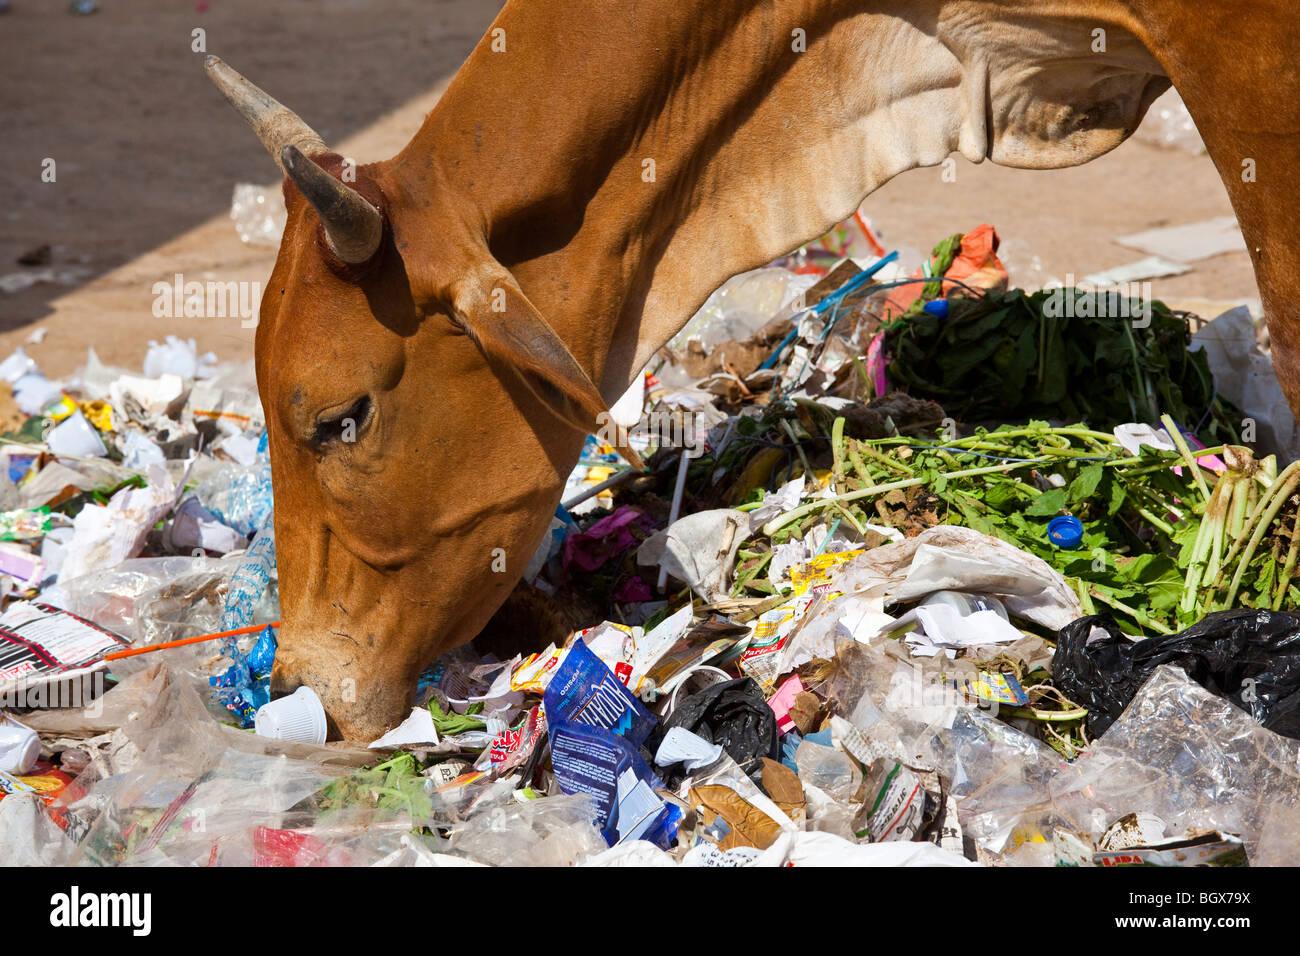 Kuh Essen Müll in Pushkar, Indien Stockbild